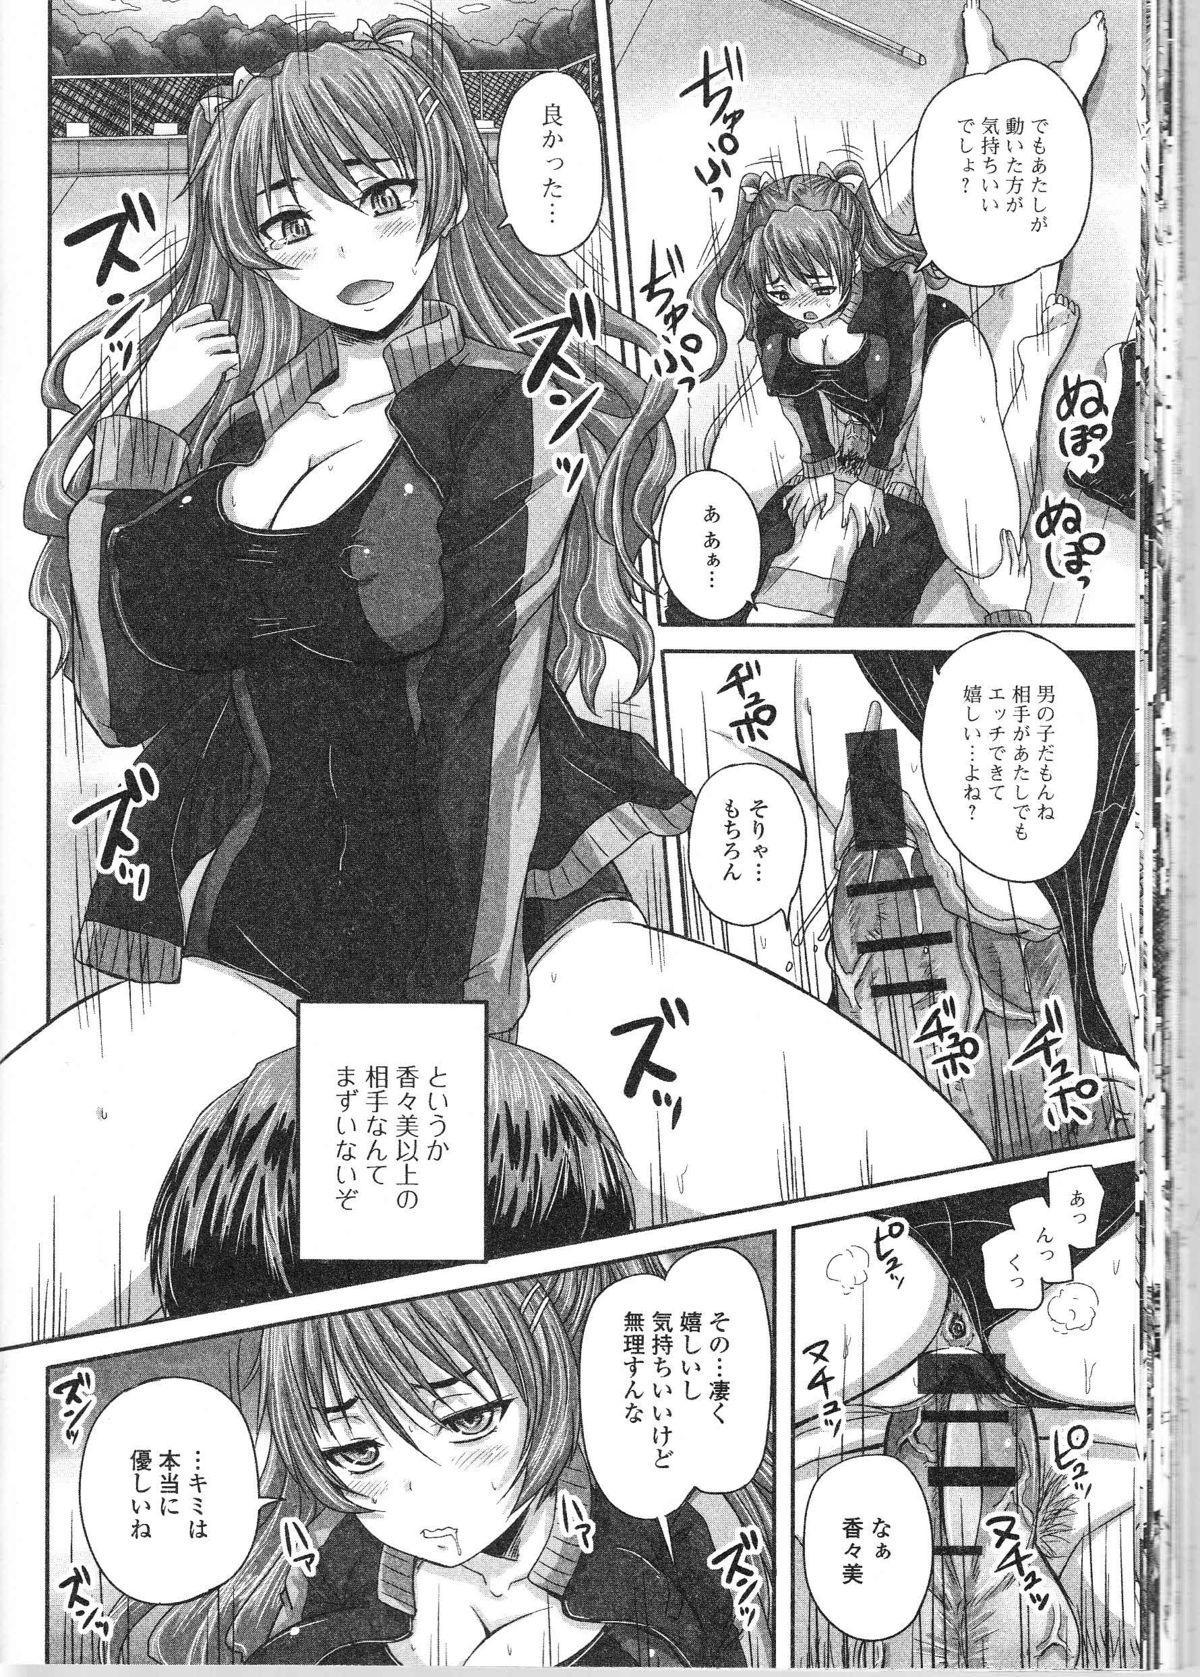 Nozoite wa Ikenai 9 - Do Not Peep! 9 60